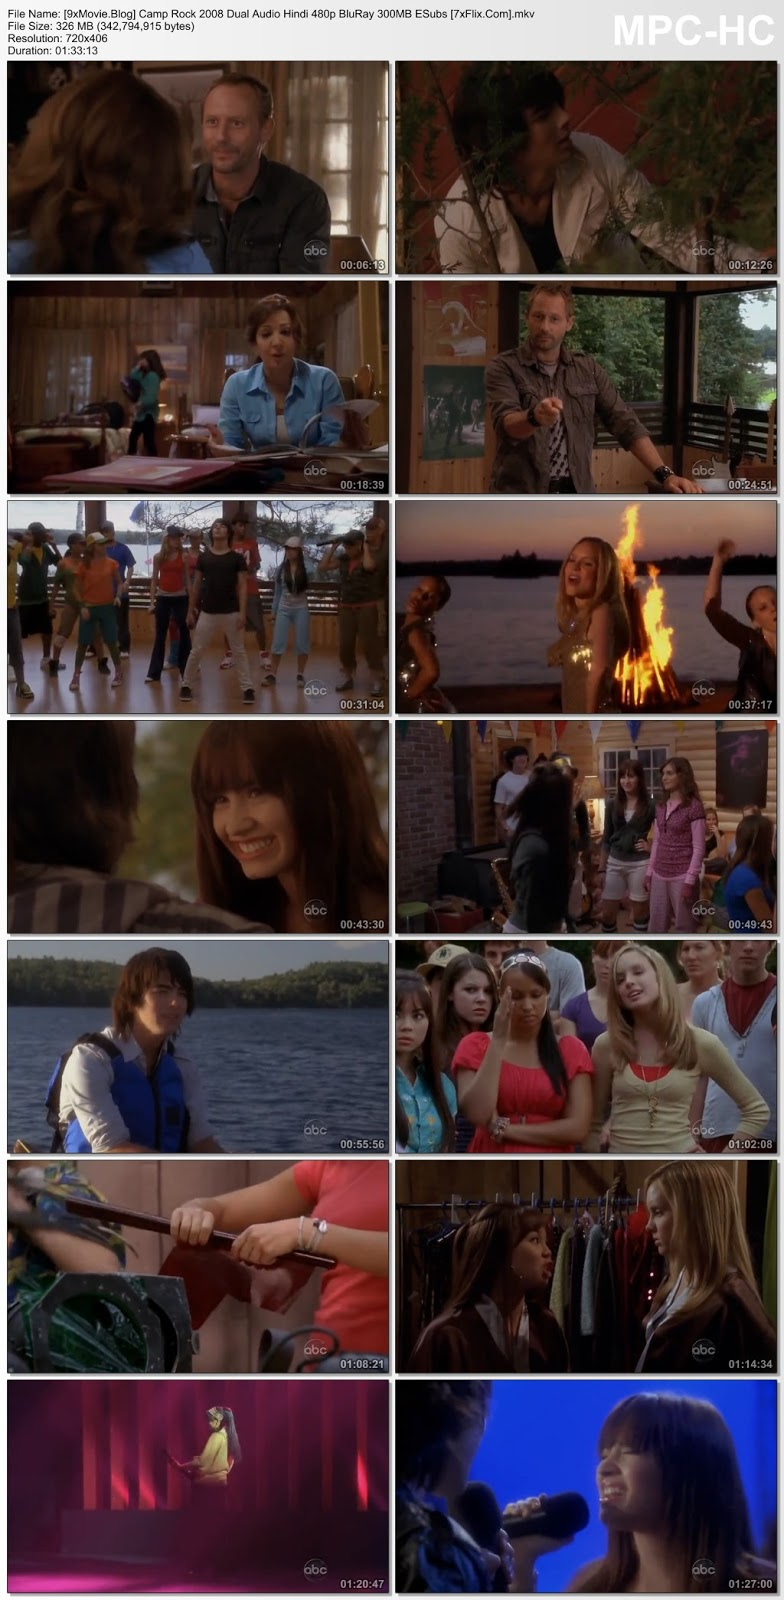 Camp Rock 2008 Dual Audio Hindi 480p BluRay x264 300MB ESubs